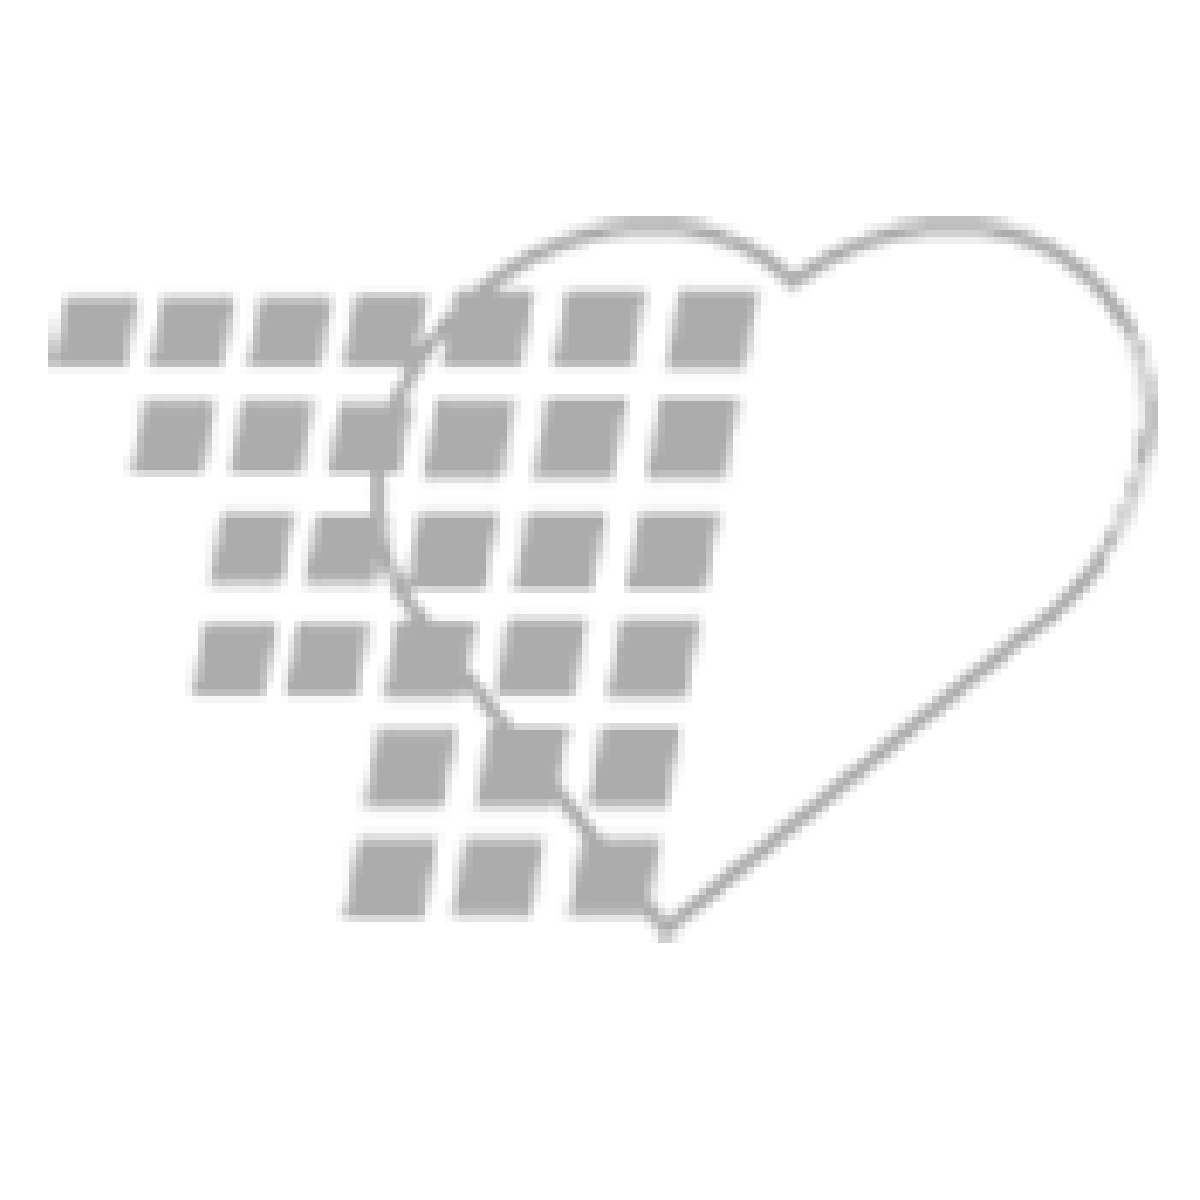 06-93-2011 - Demo Dose® 2mL Clear Ampule